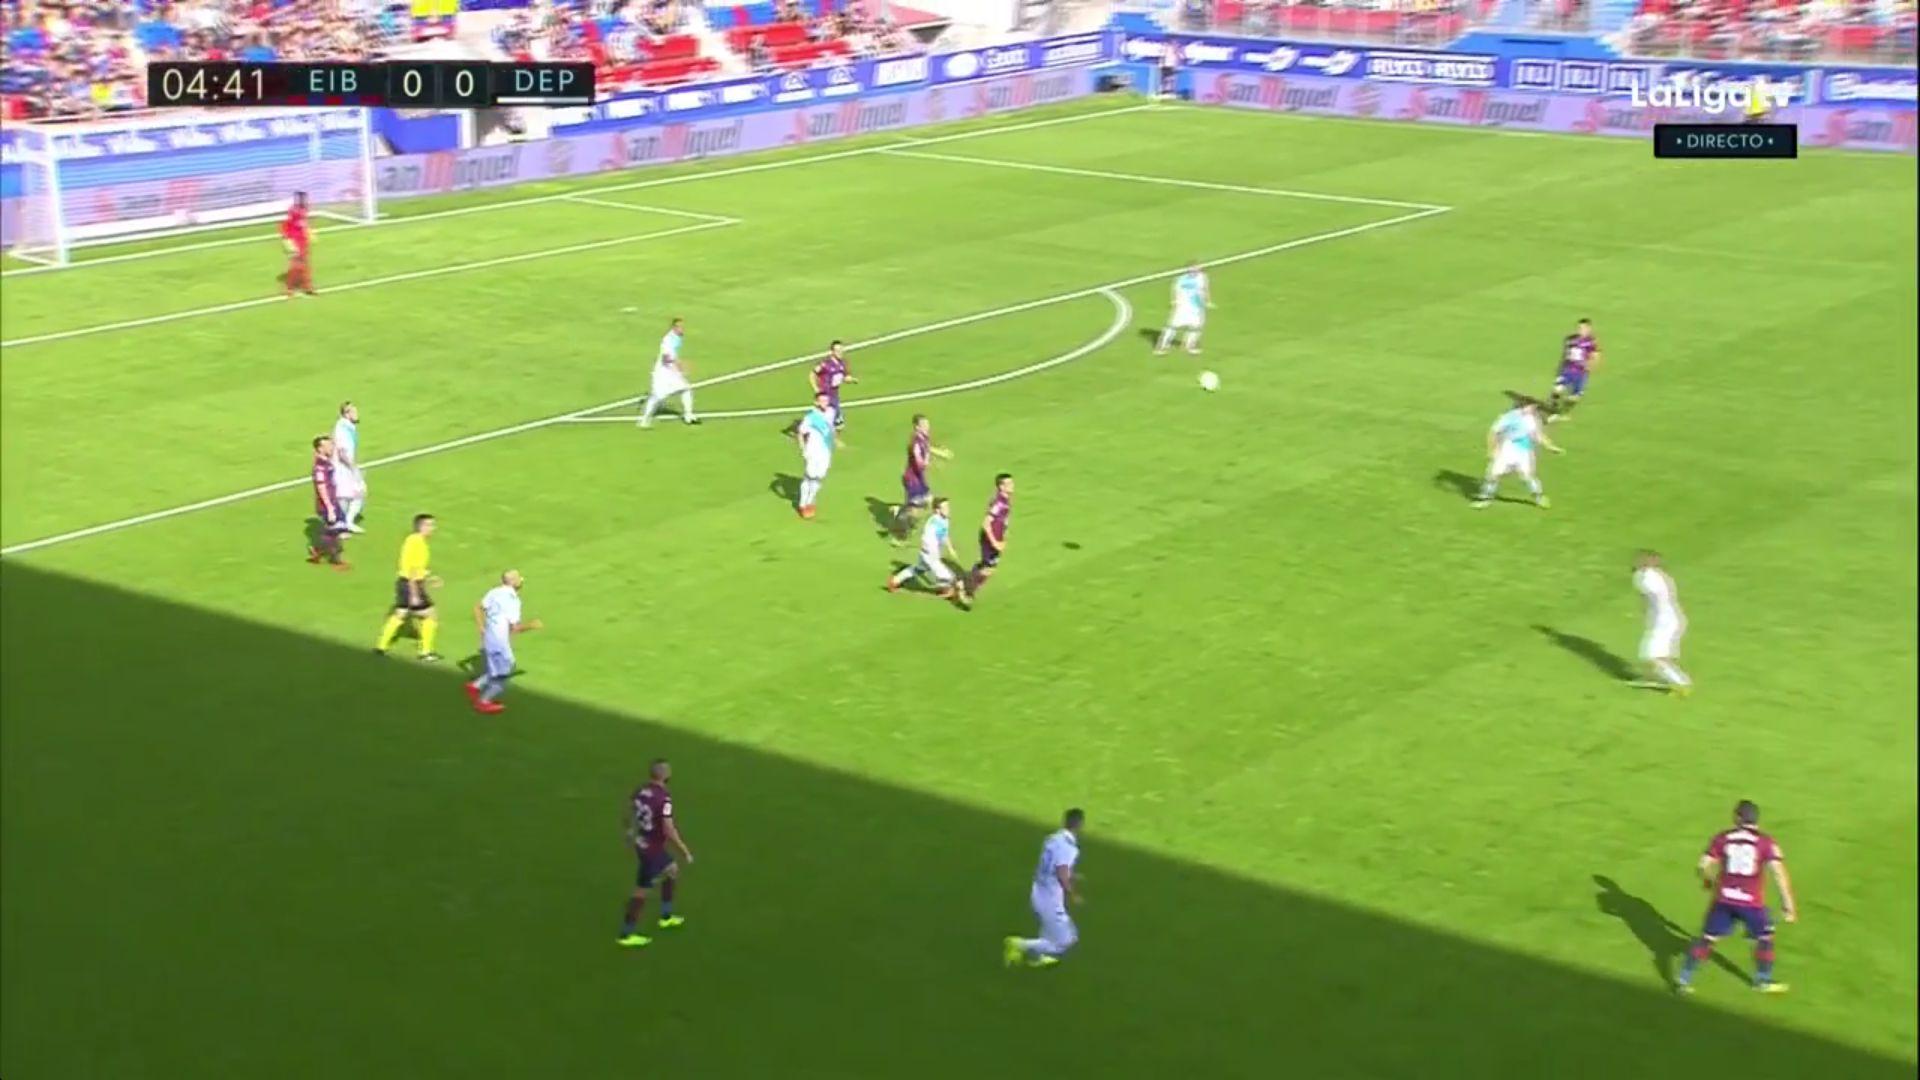 15-10-2017 - Eibar 0-0 Deportivo La Coruna